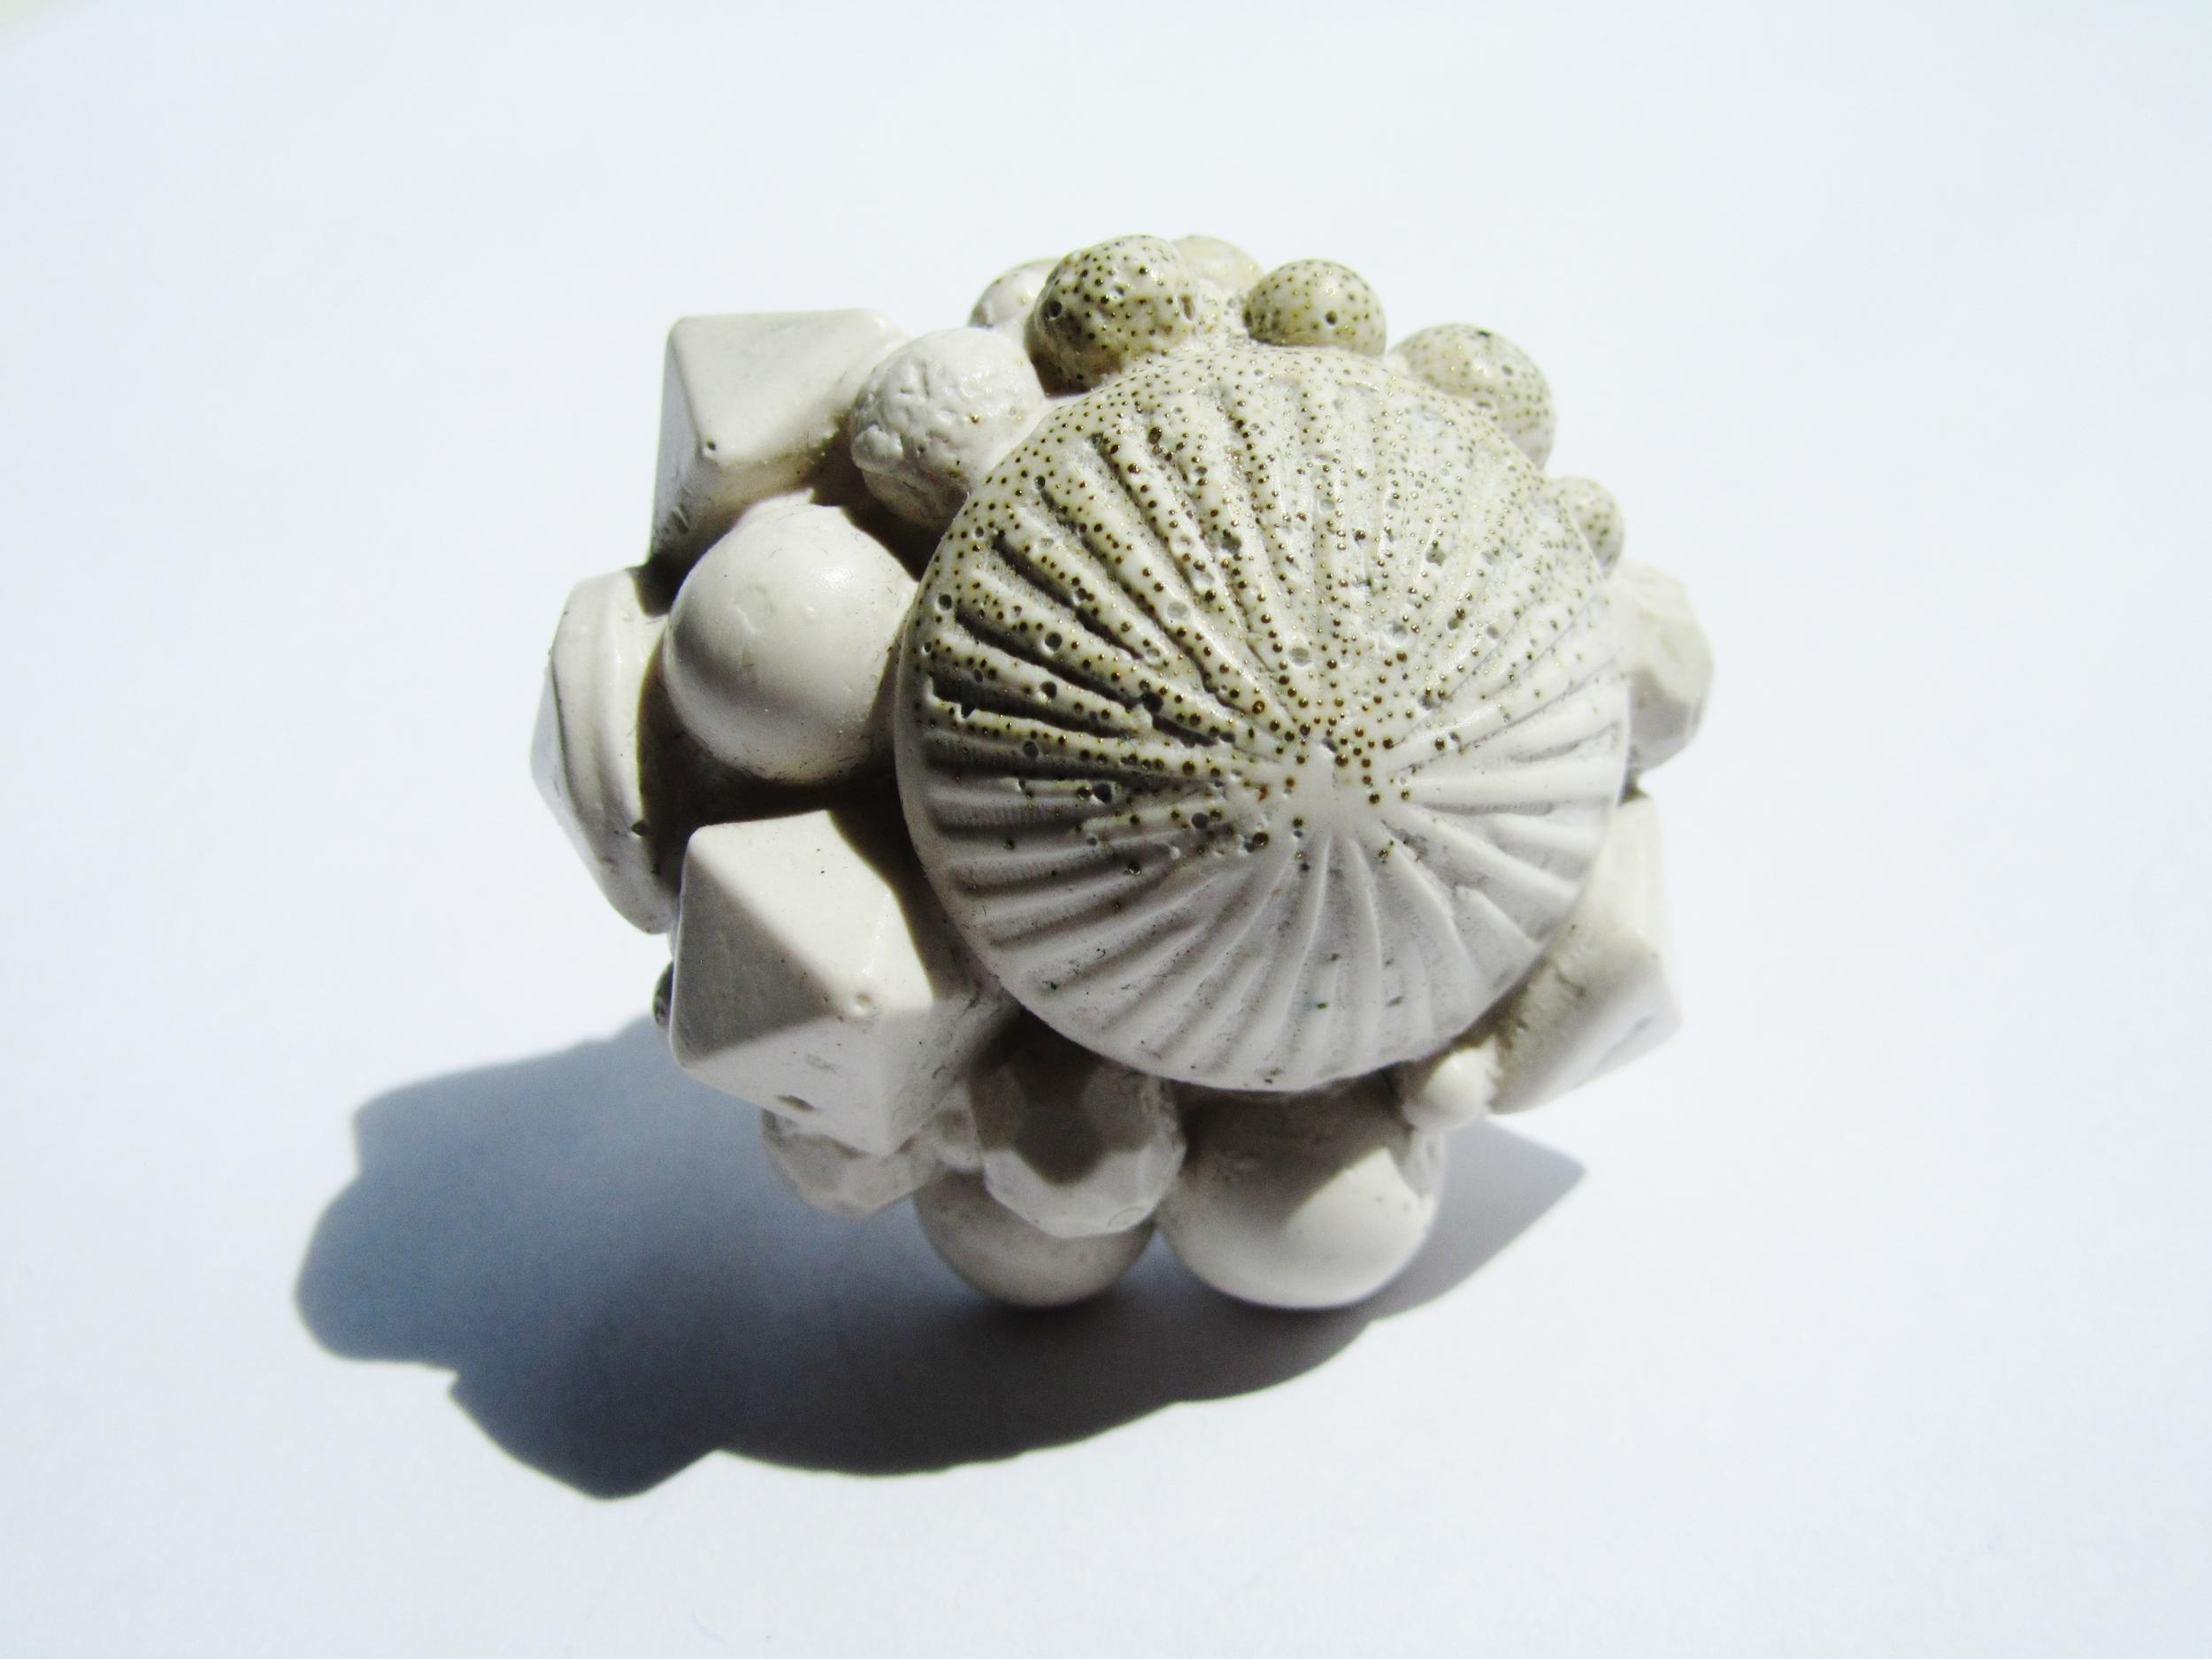 jade mellor white urchin gold caviar ring.JPG